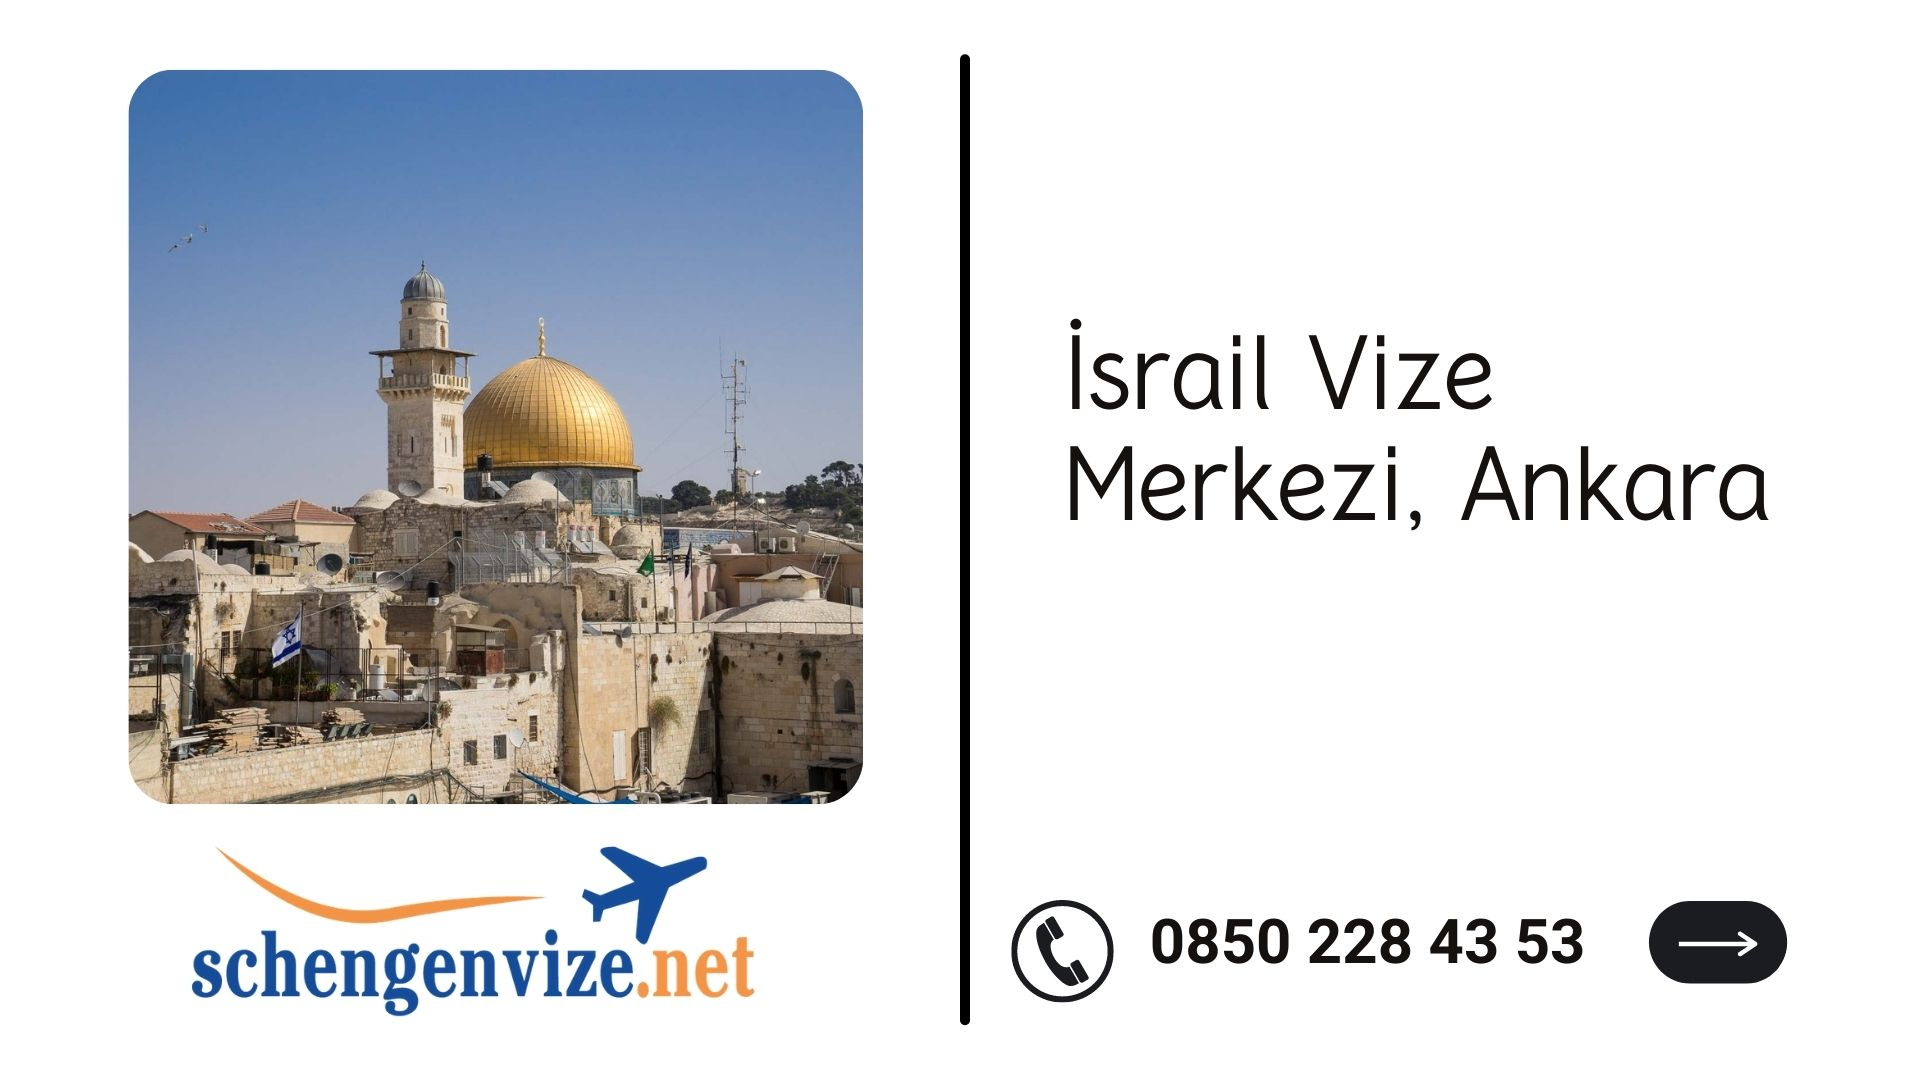 İsrail Vize Merkezi, Ankara